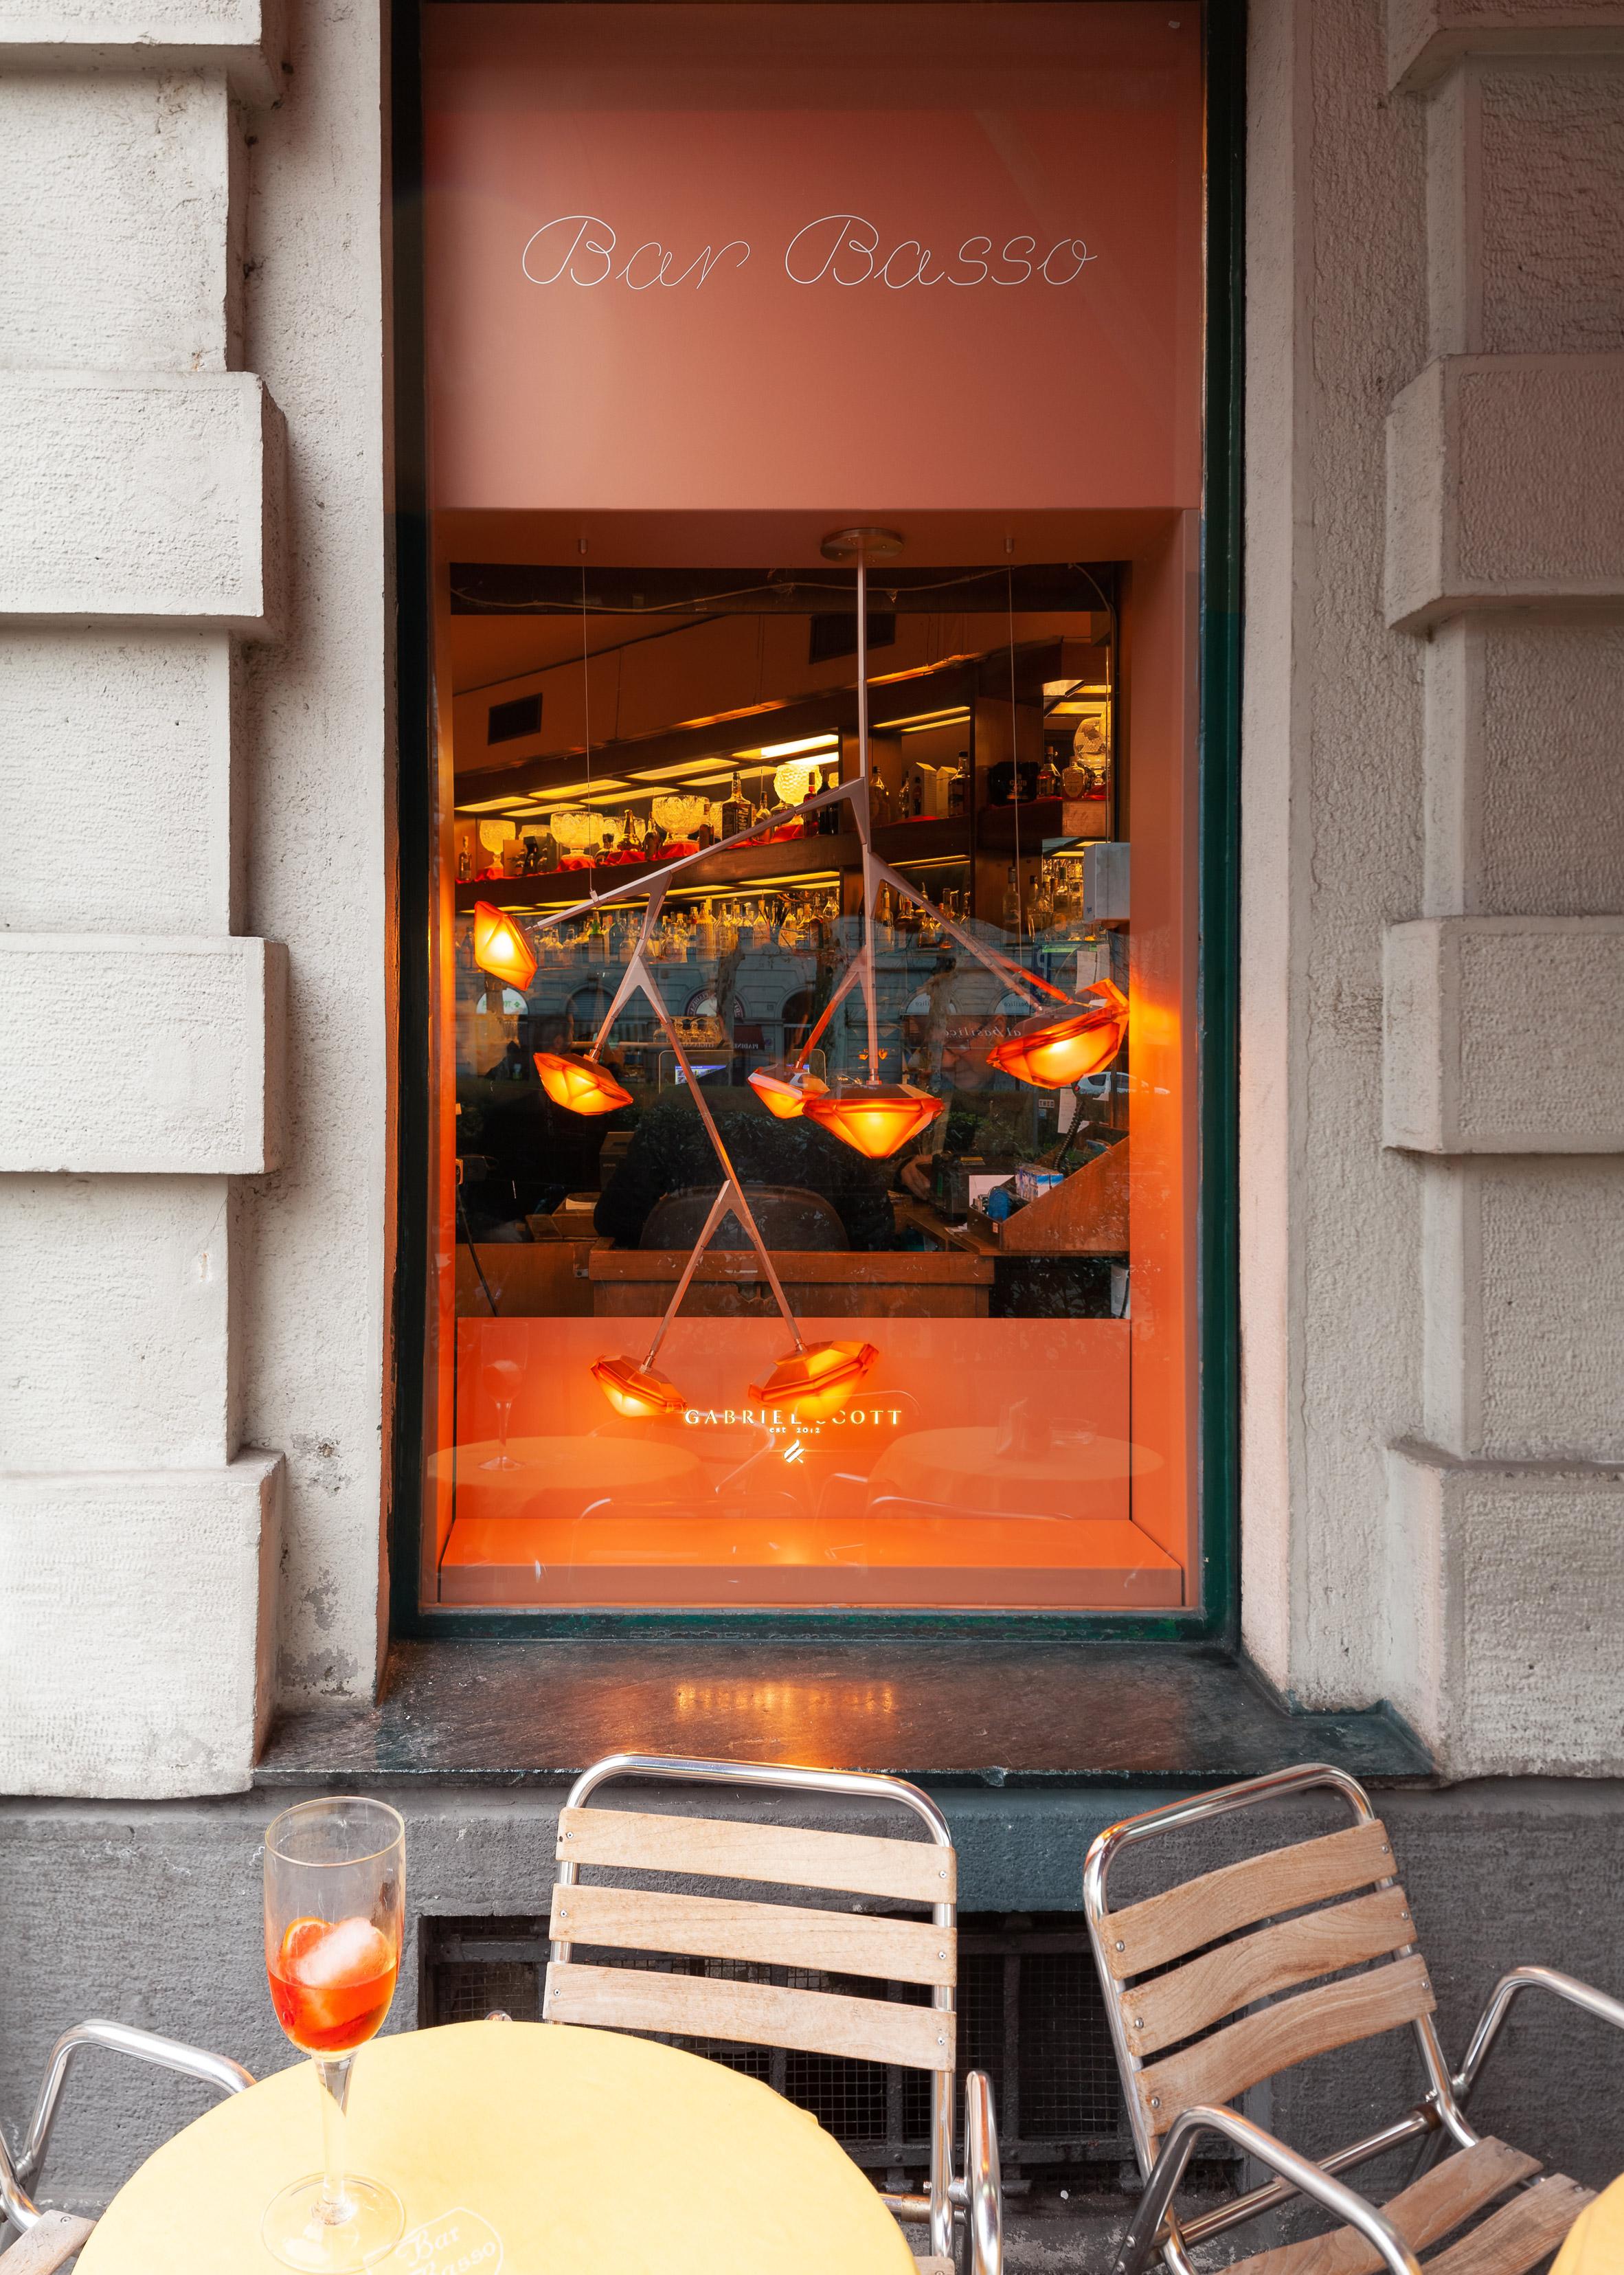 Gabriel Scott installs cocktail-inspired lights at Milan's infamous Bar Basso